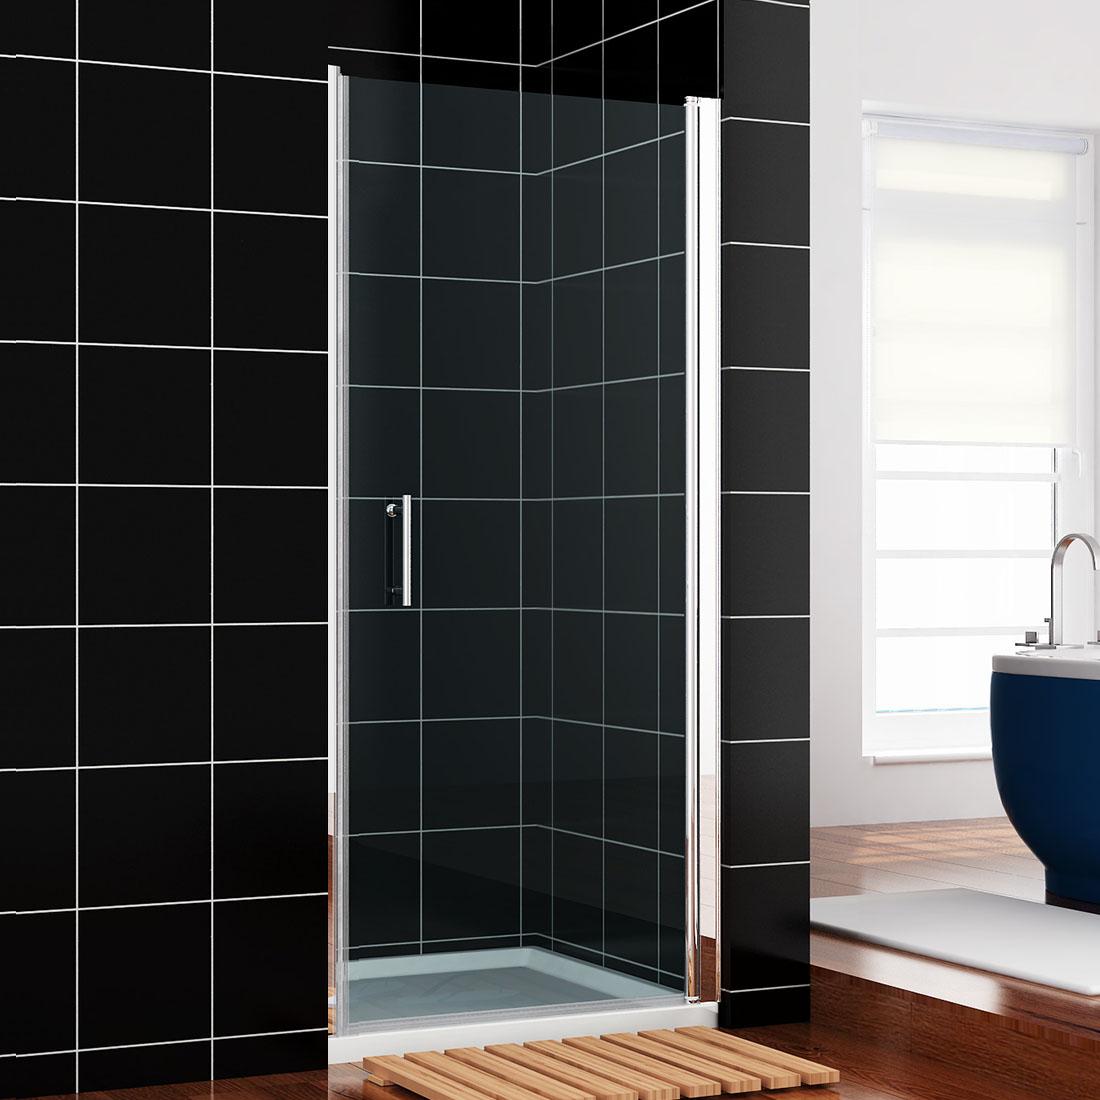 Bifold Pivot Walk In Wet Room Sliding Shower Door Enclosure Hinge Glass Cubicle